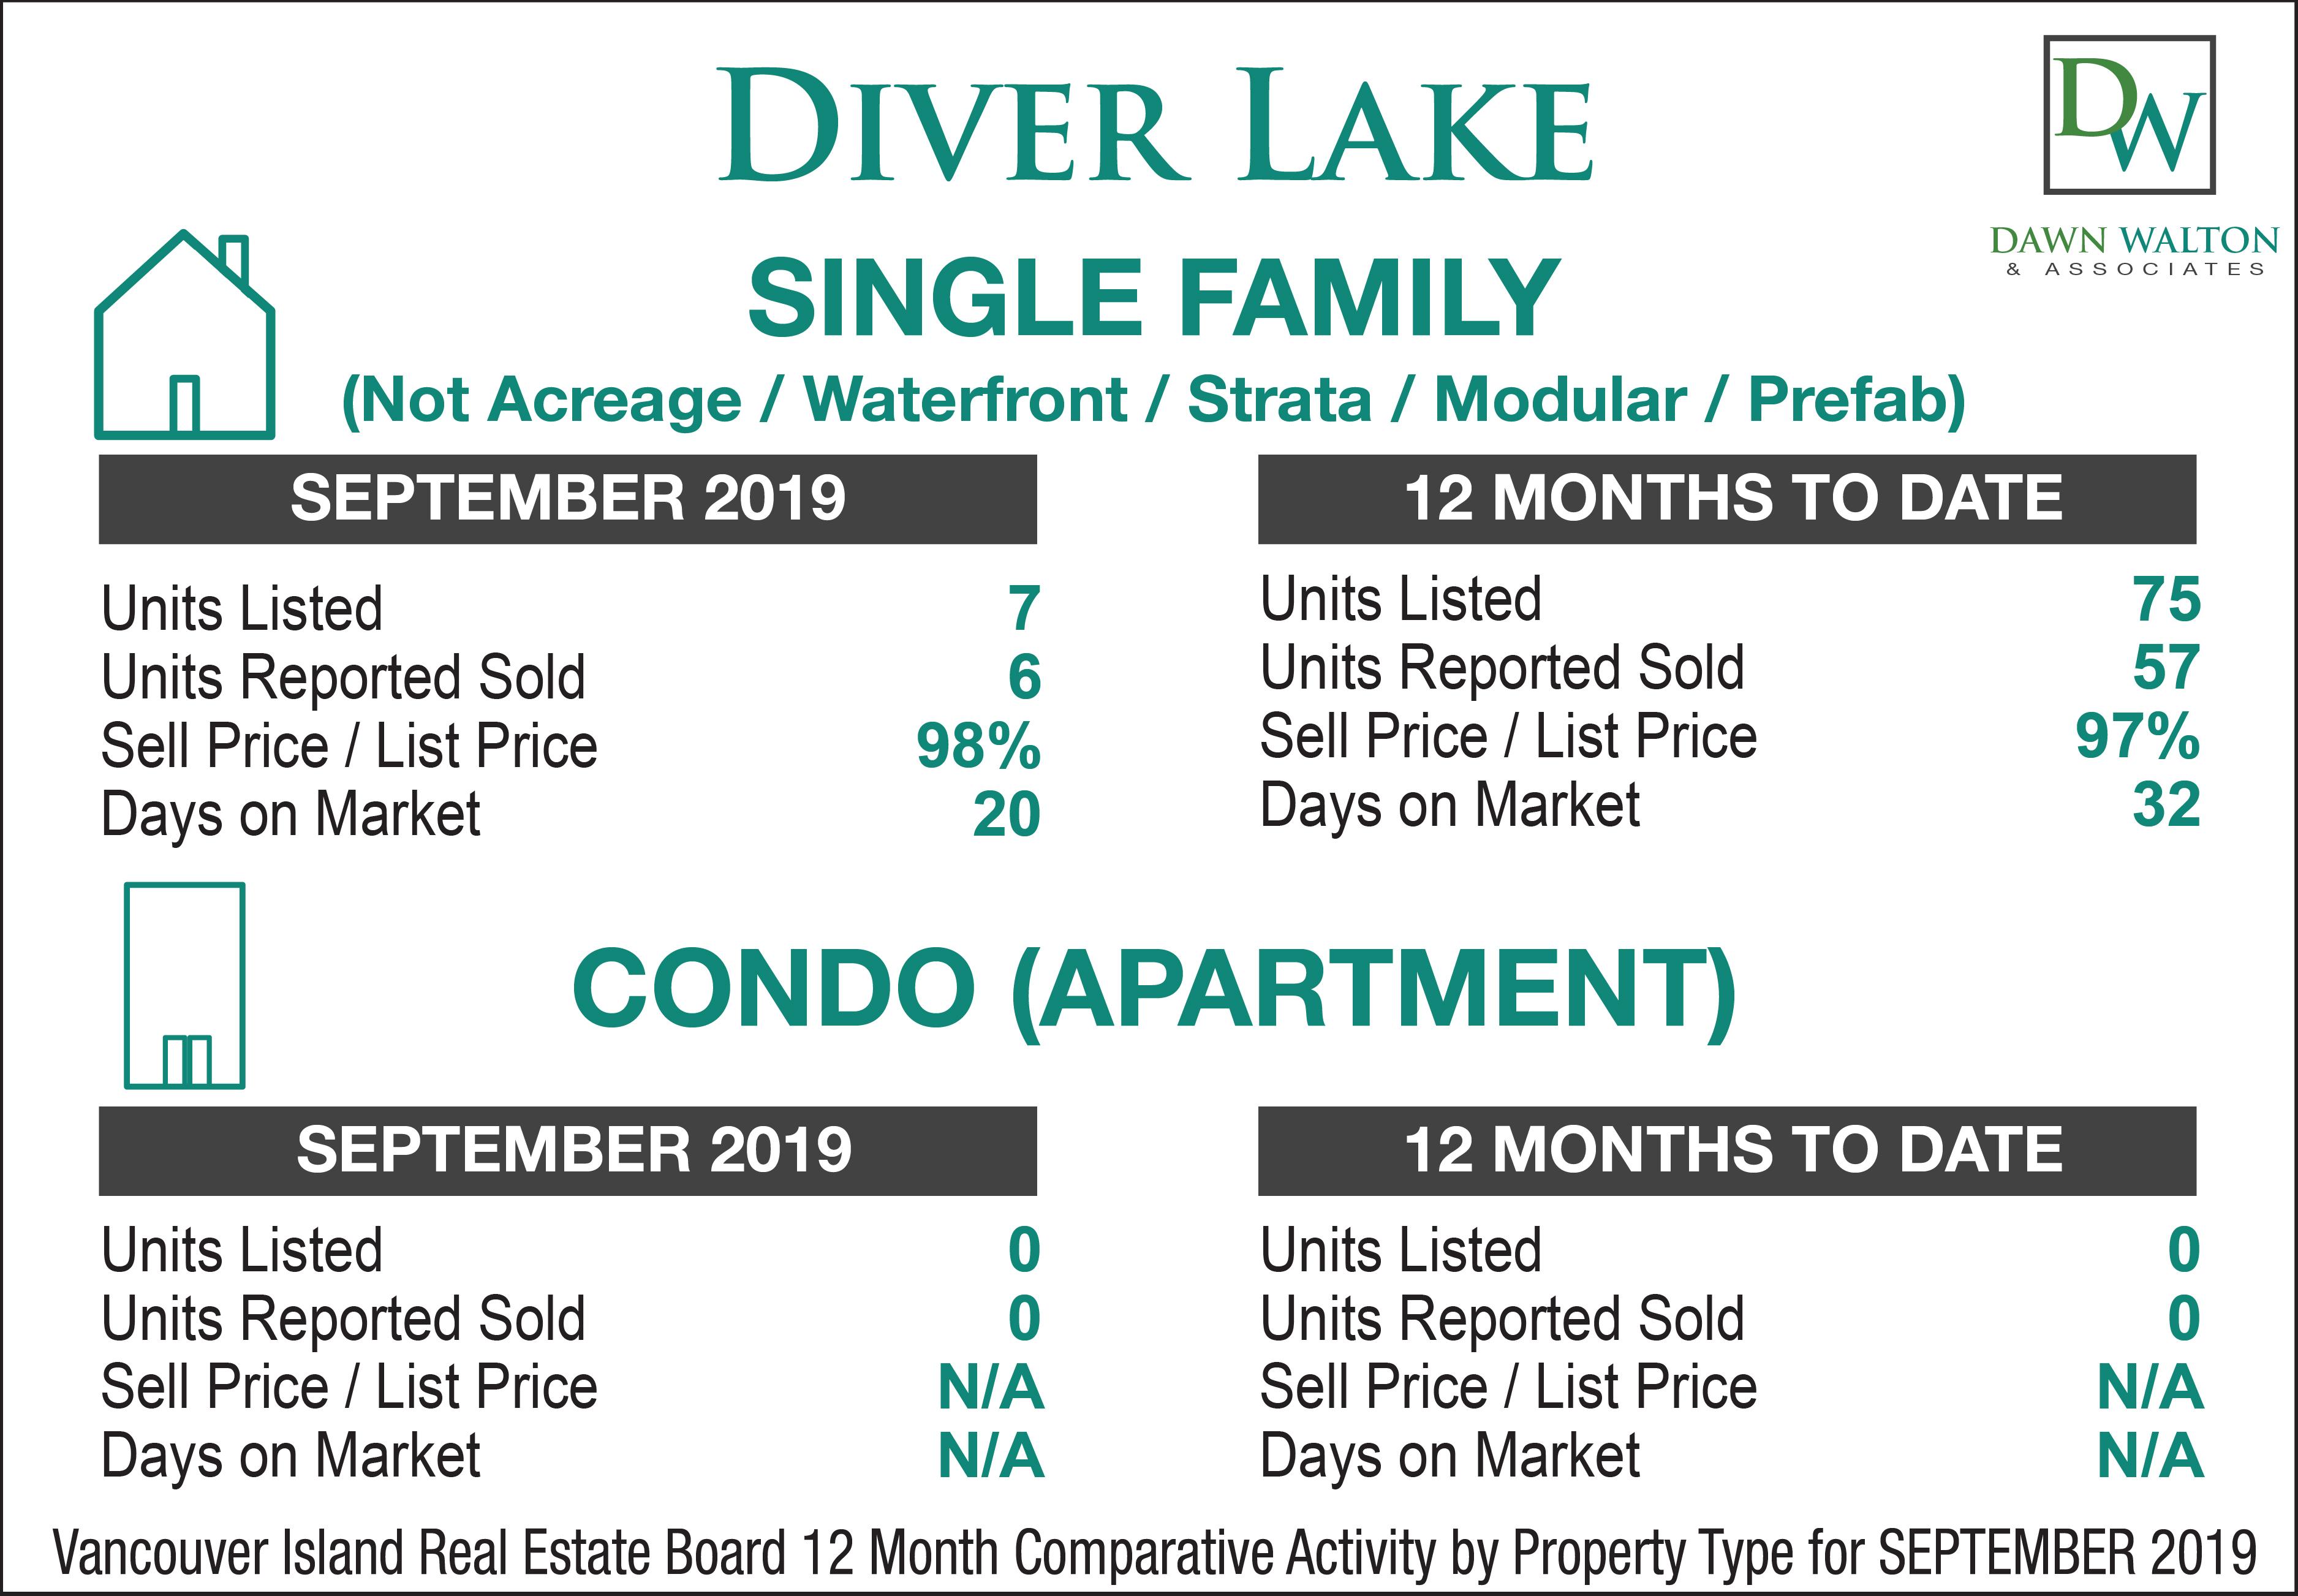 Diver Lake Real Estate Market Stats September 2019 - Nanaimo Realtor Dawn Walton